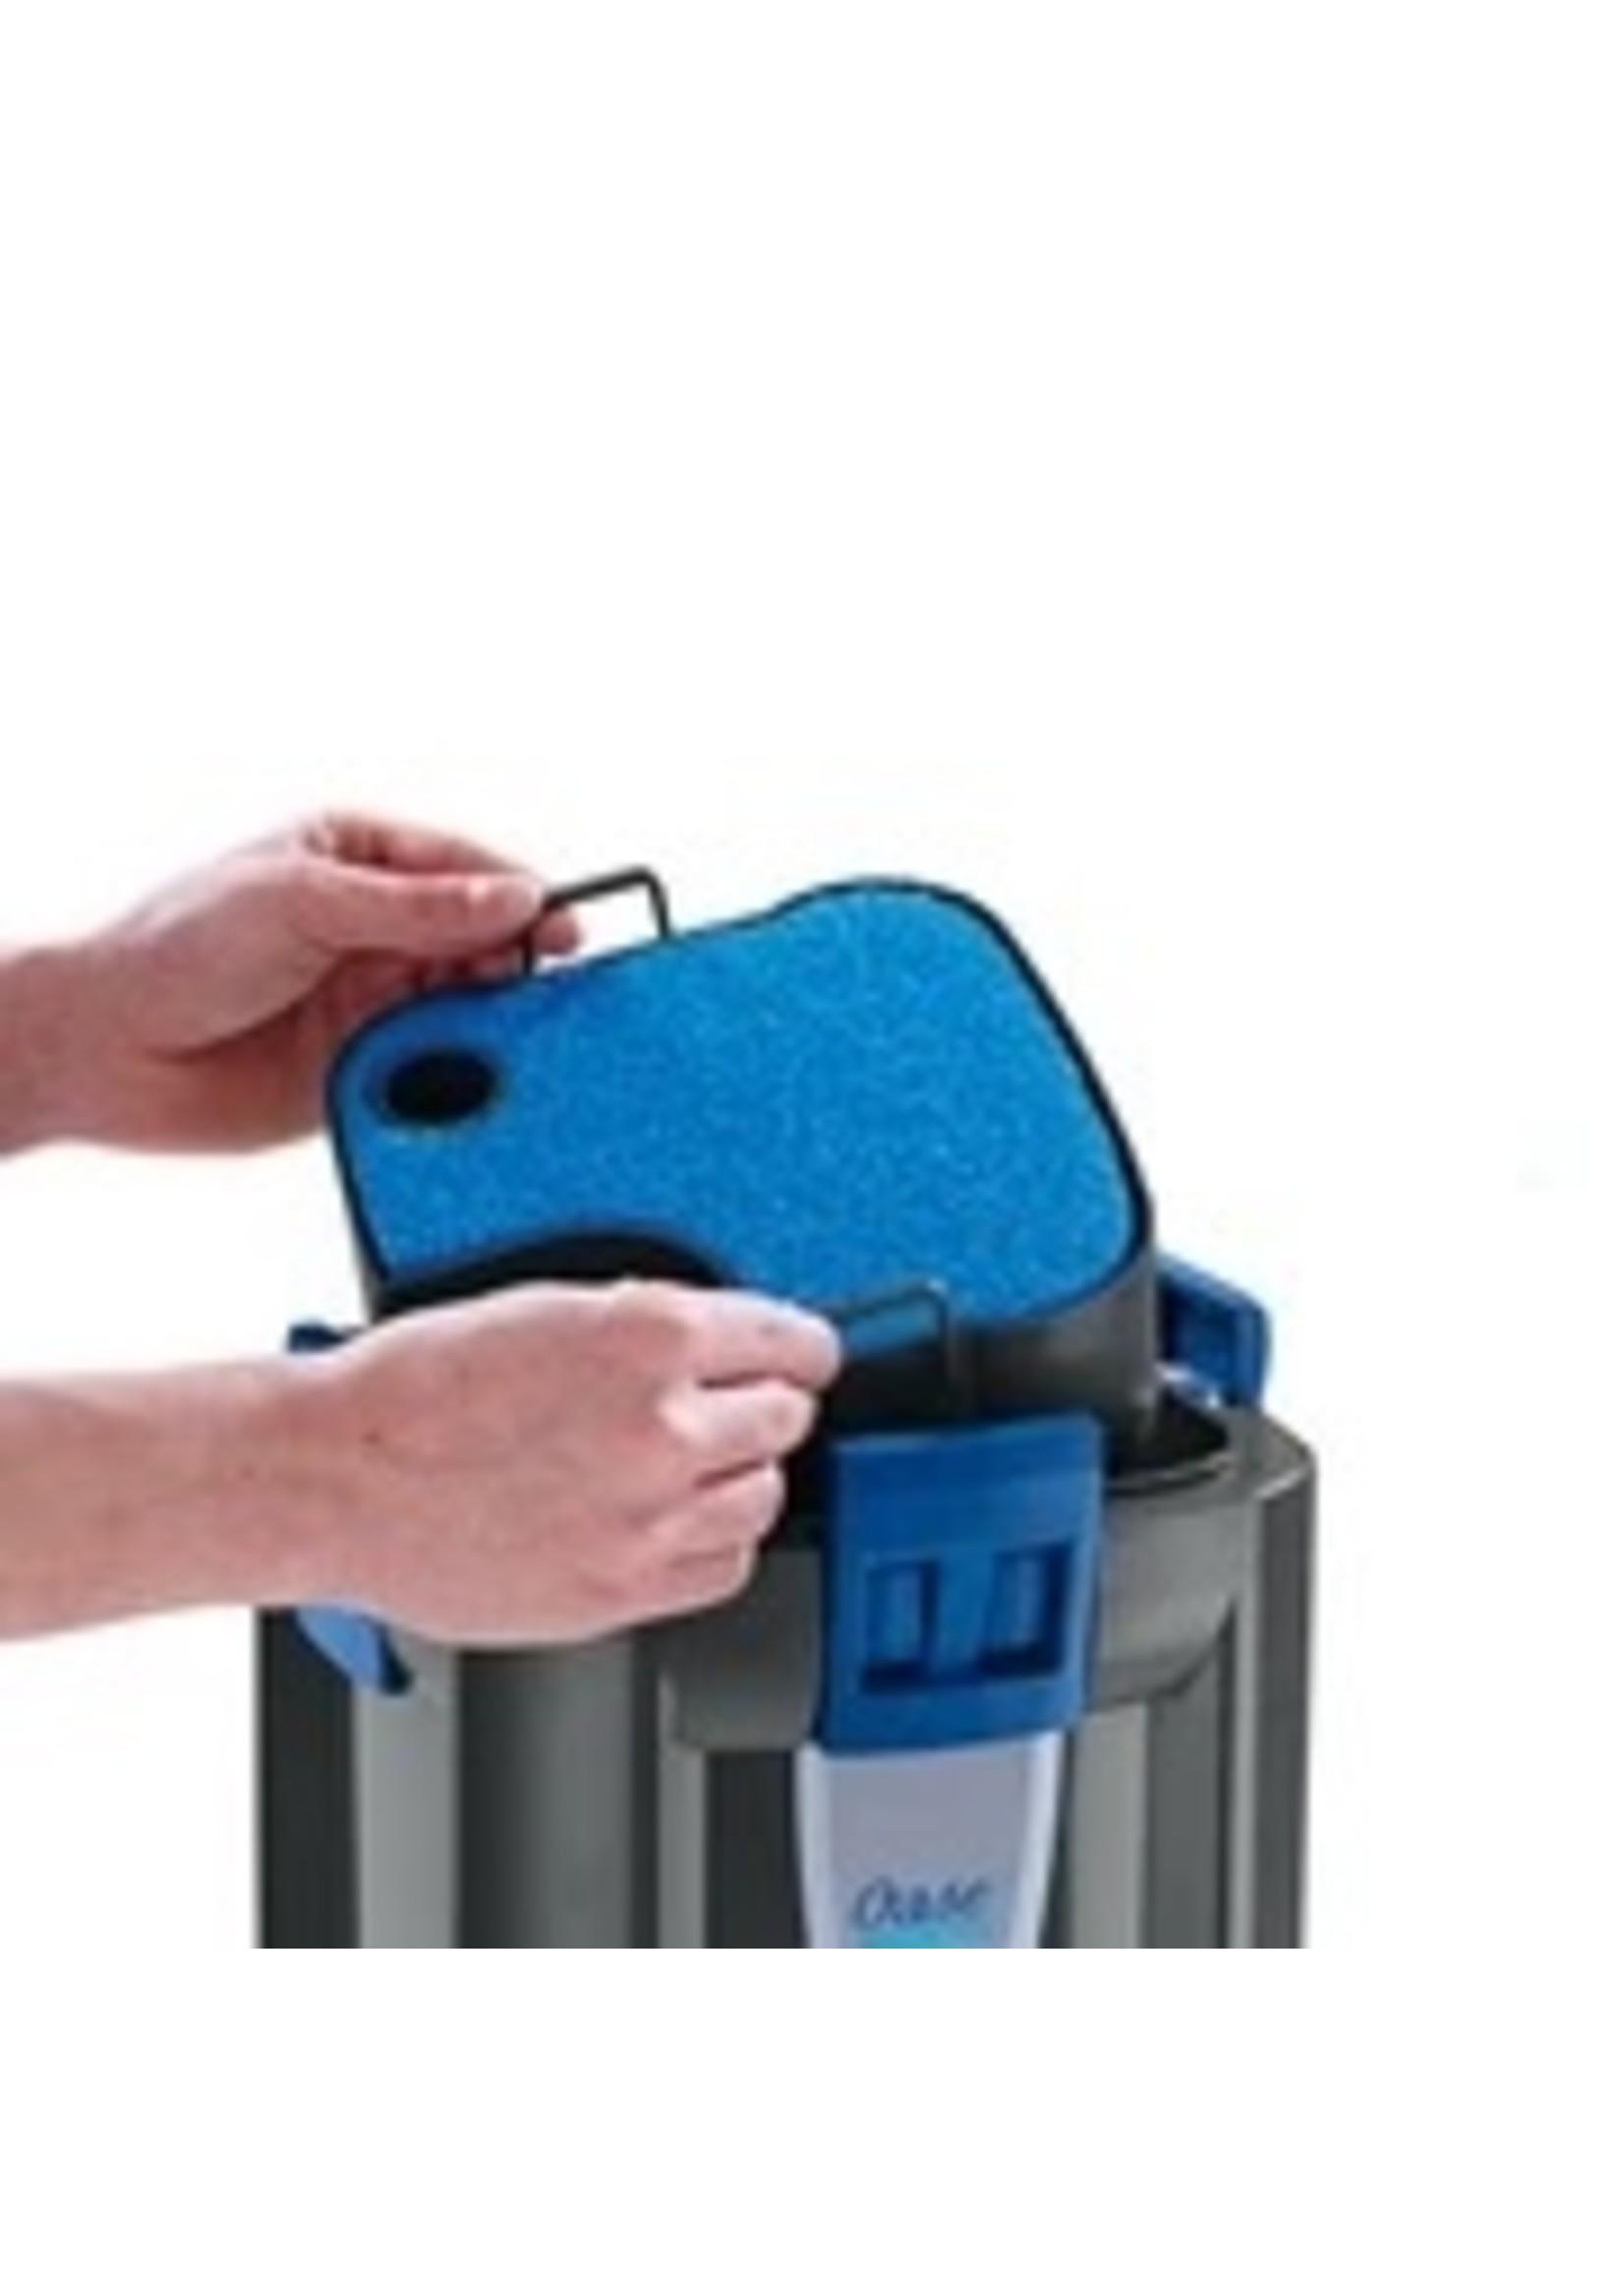 OASE OASE BioMaster 250 External Filter